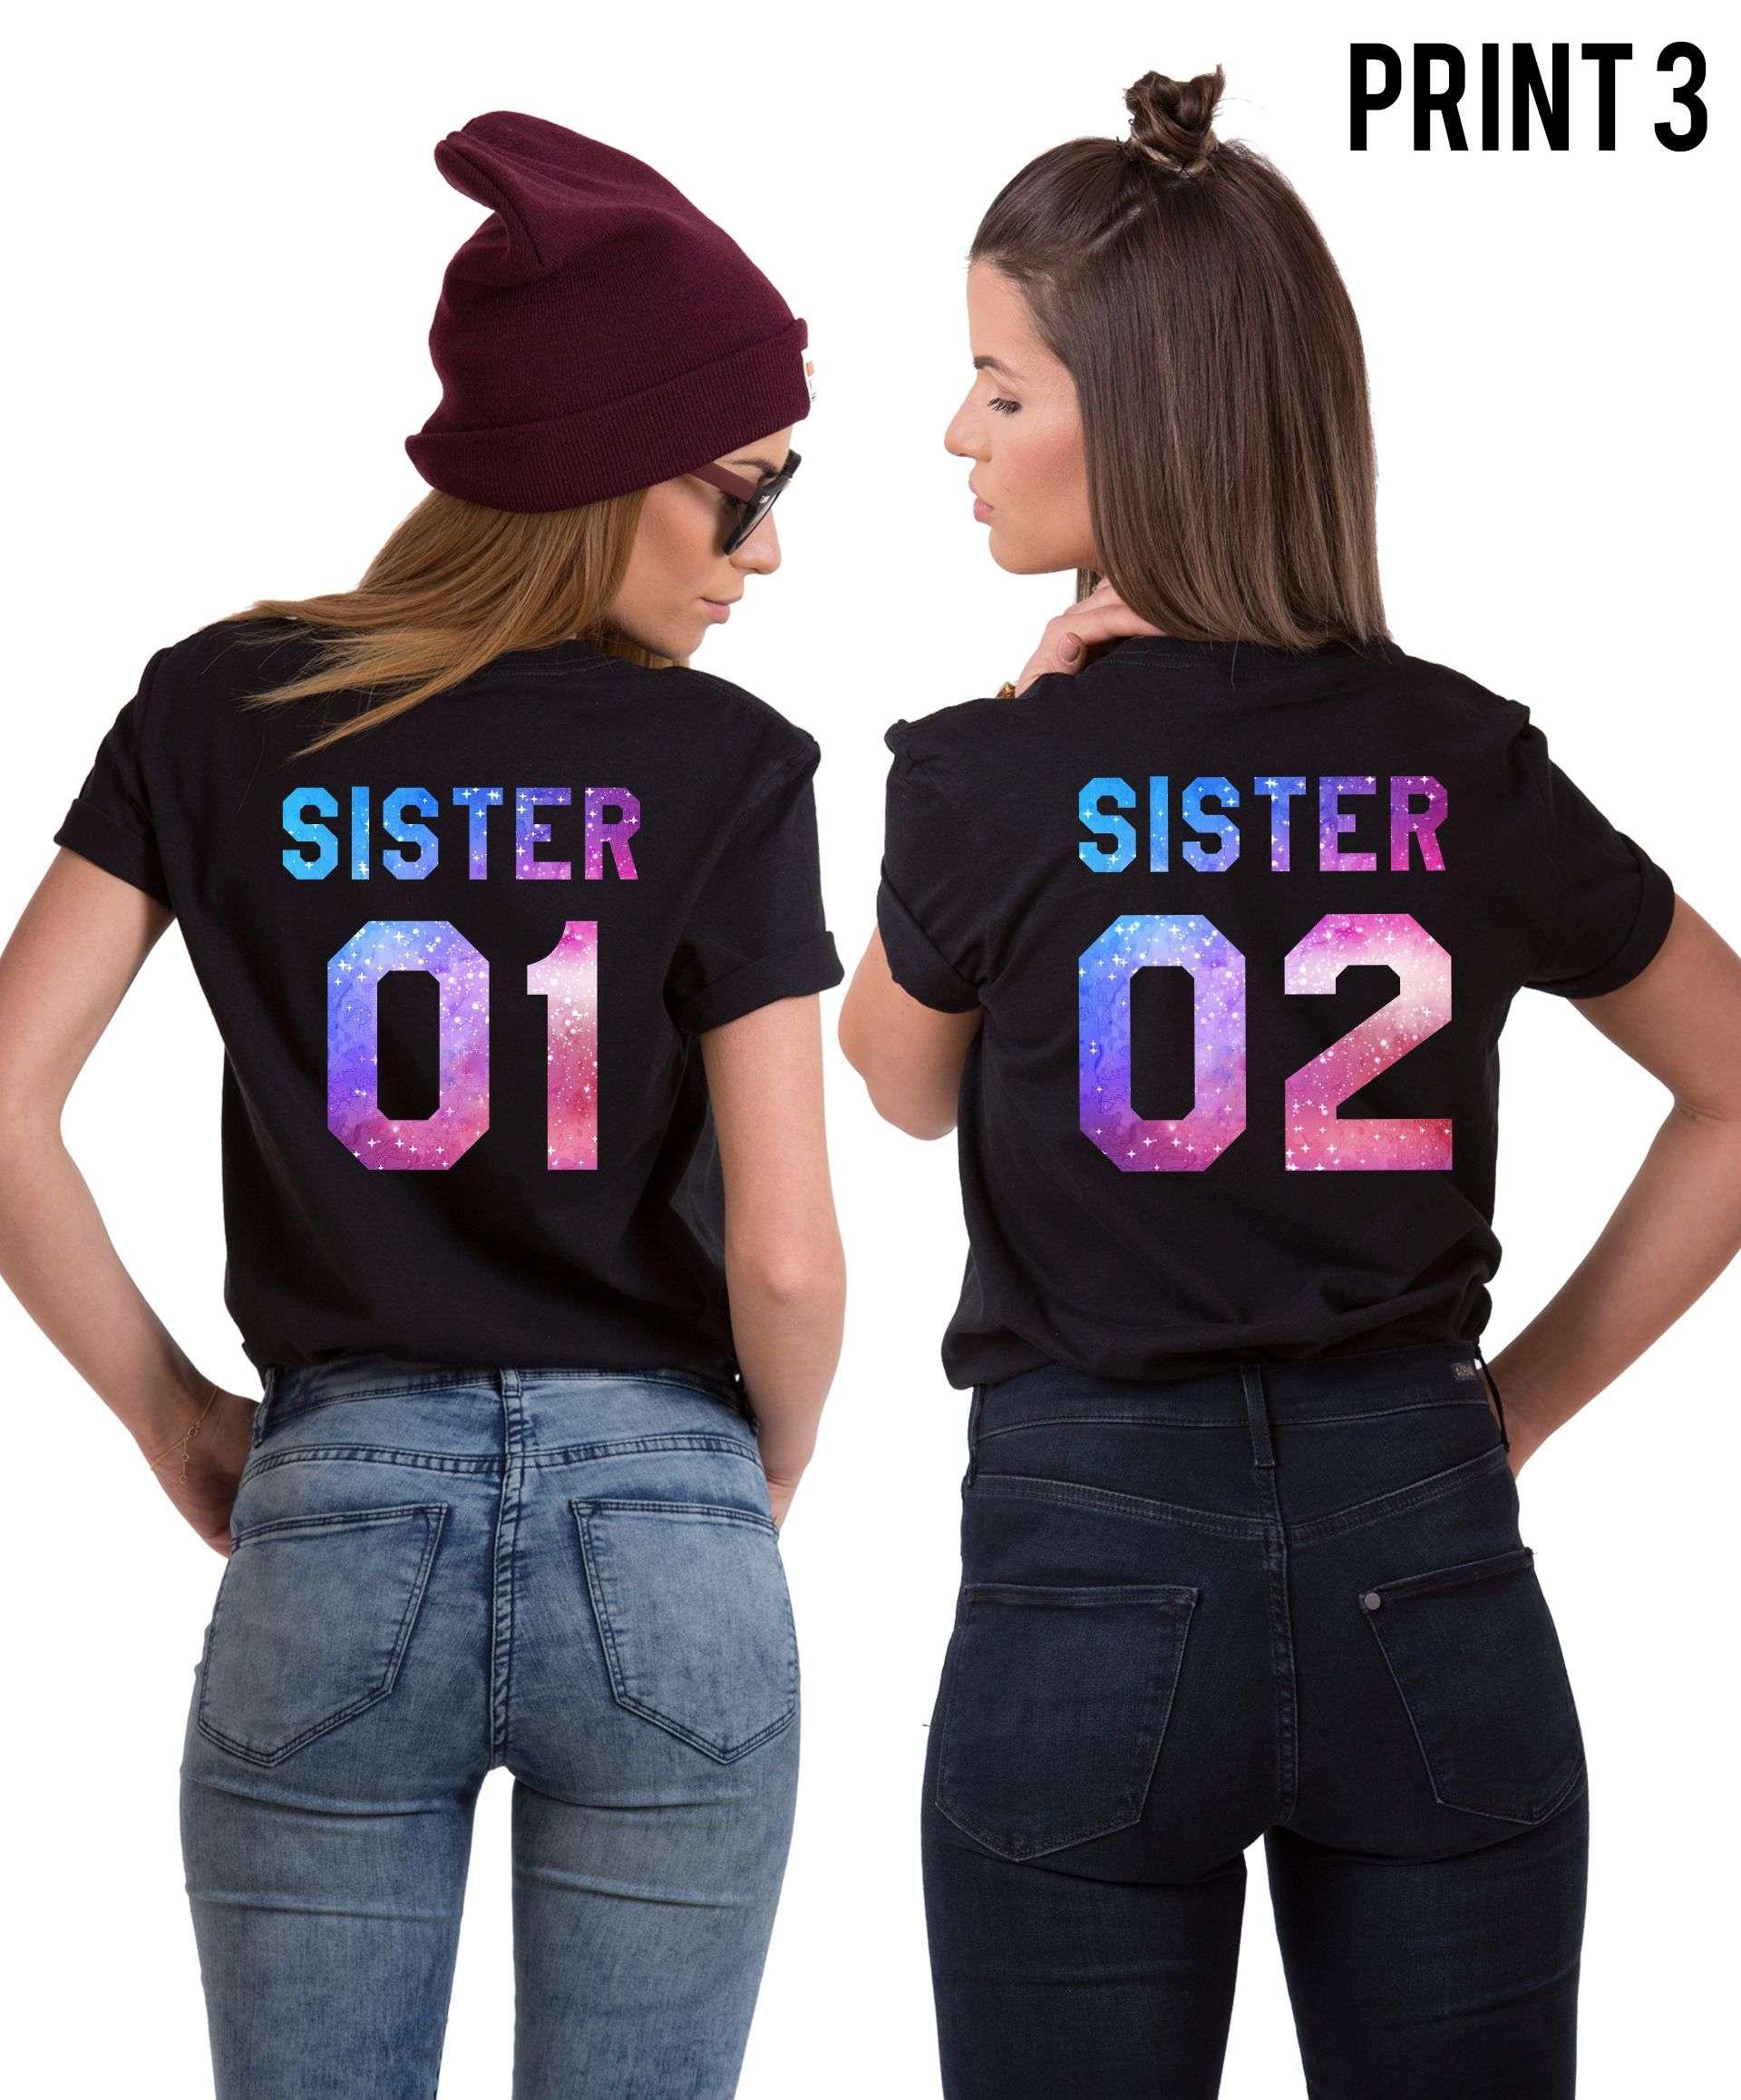 Sister 01 Sister 02 Patterns Matching Best Friends Shirts